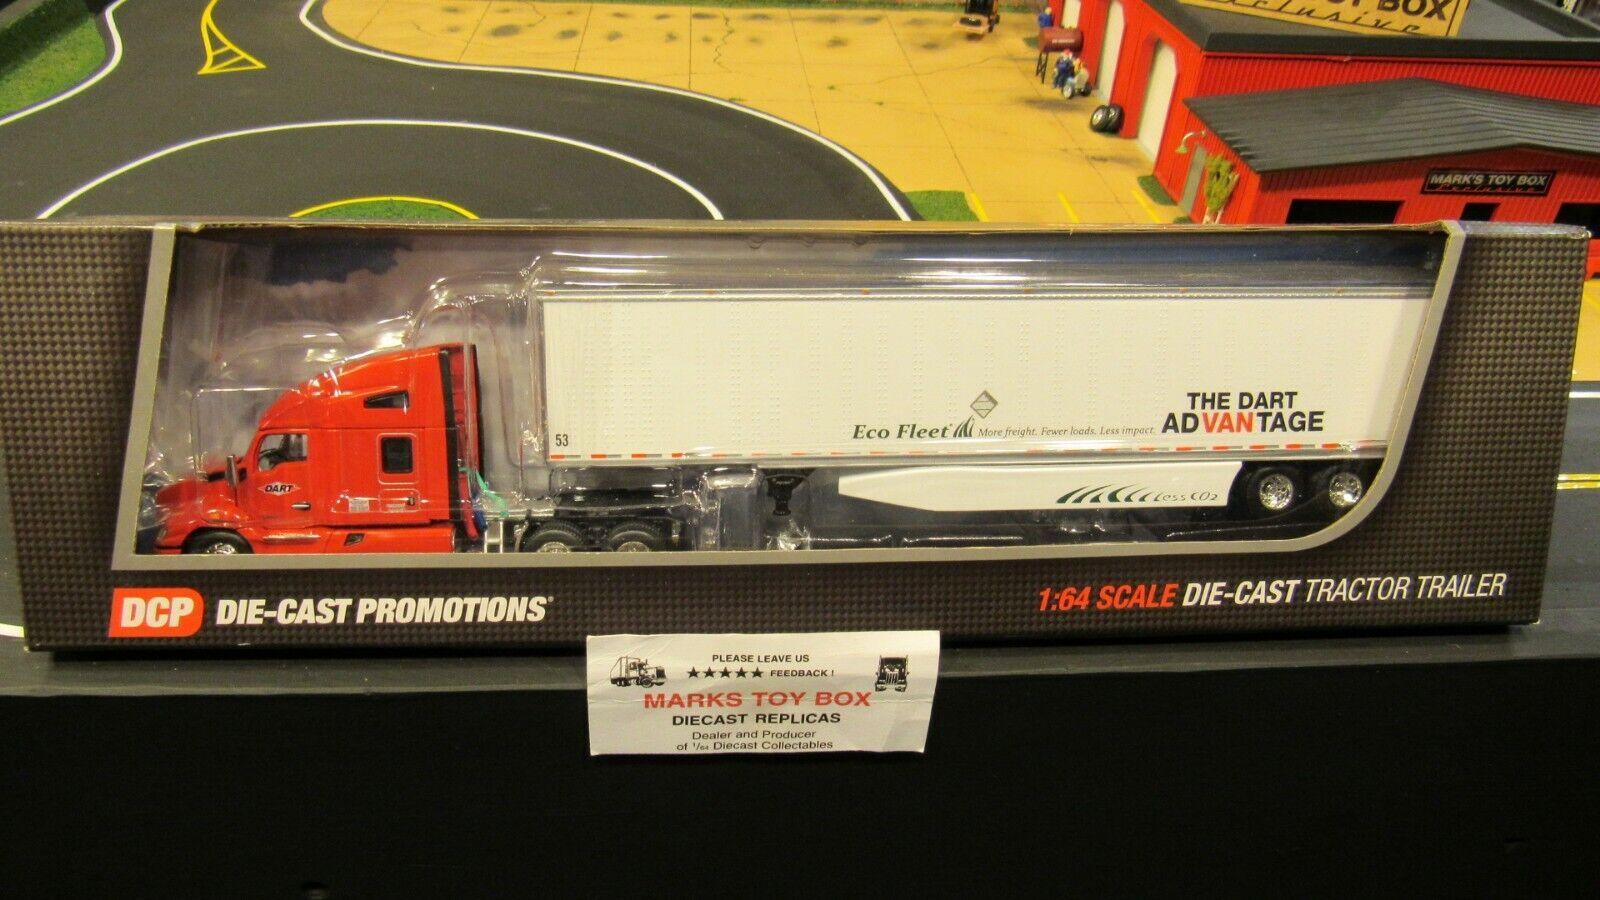 DCP 34126 DART TRANSIT COMPANY KW T680 SEMI CAB TRUCK DRY VAN TRAILER 1 64 CL